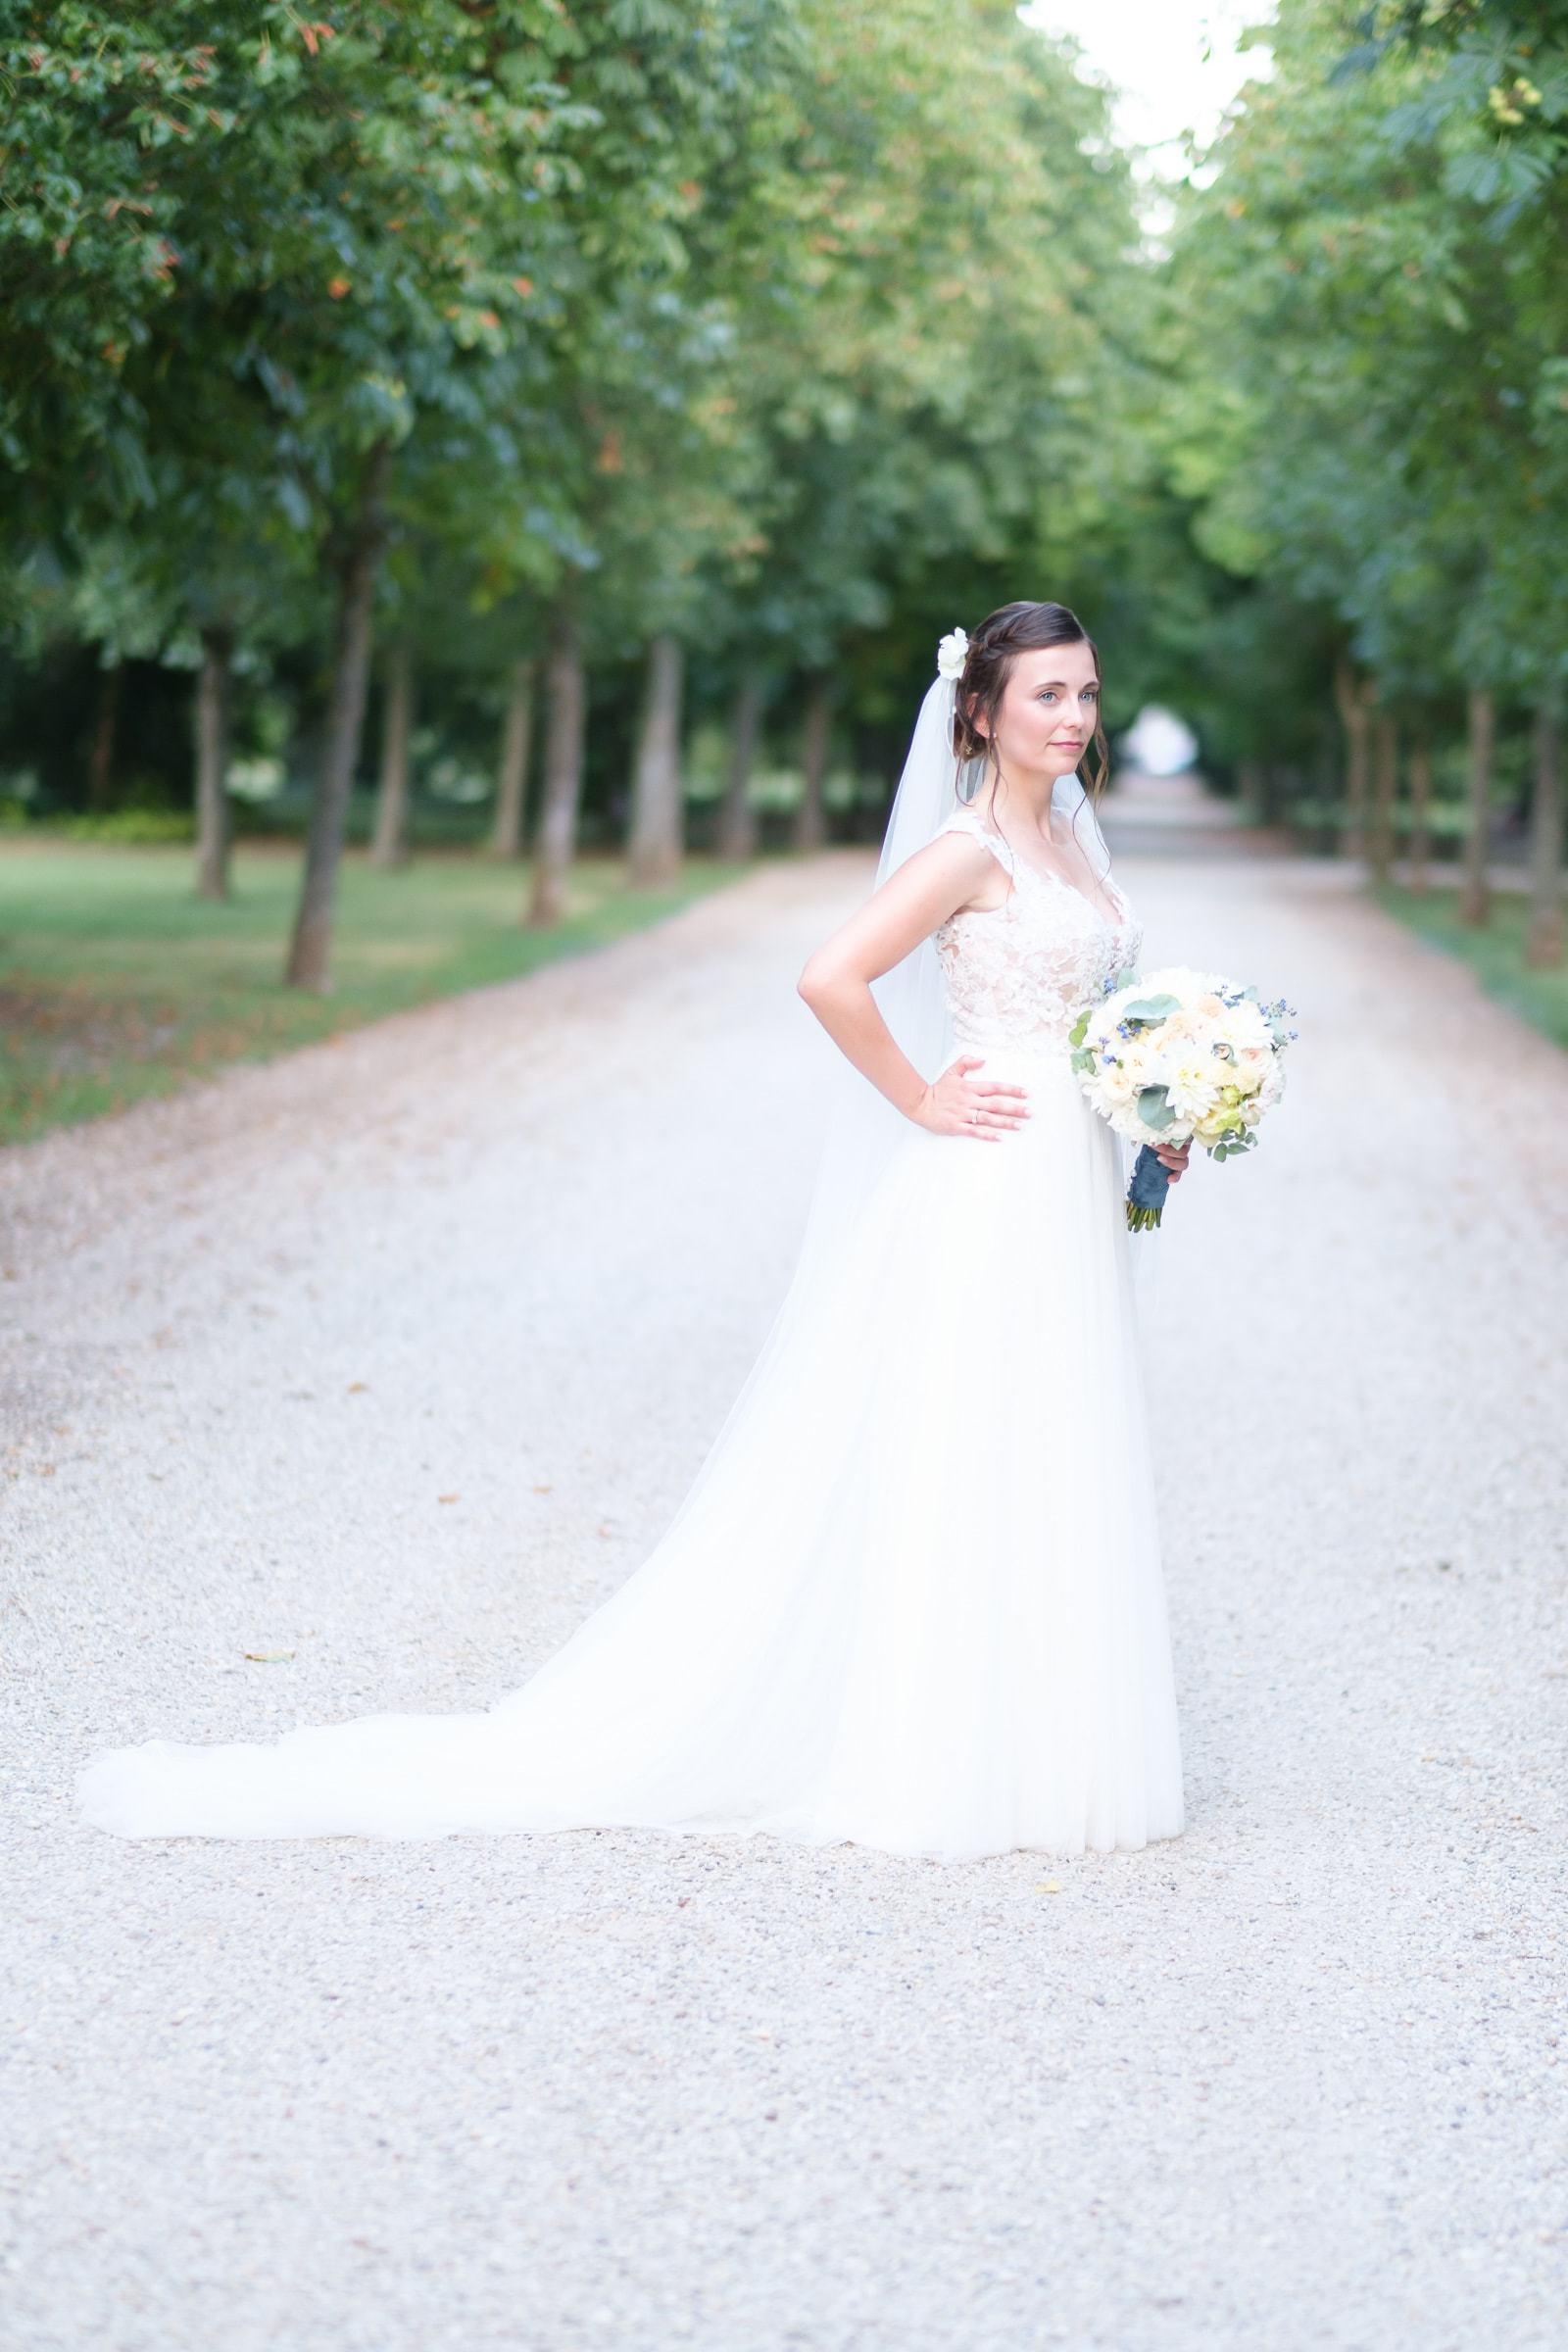 Braut Fotoshooting mit Strauß